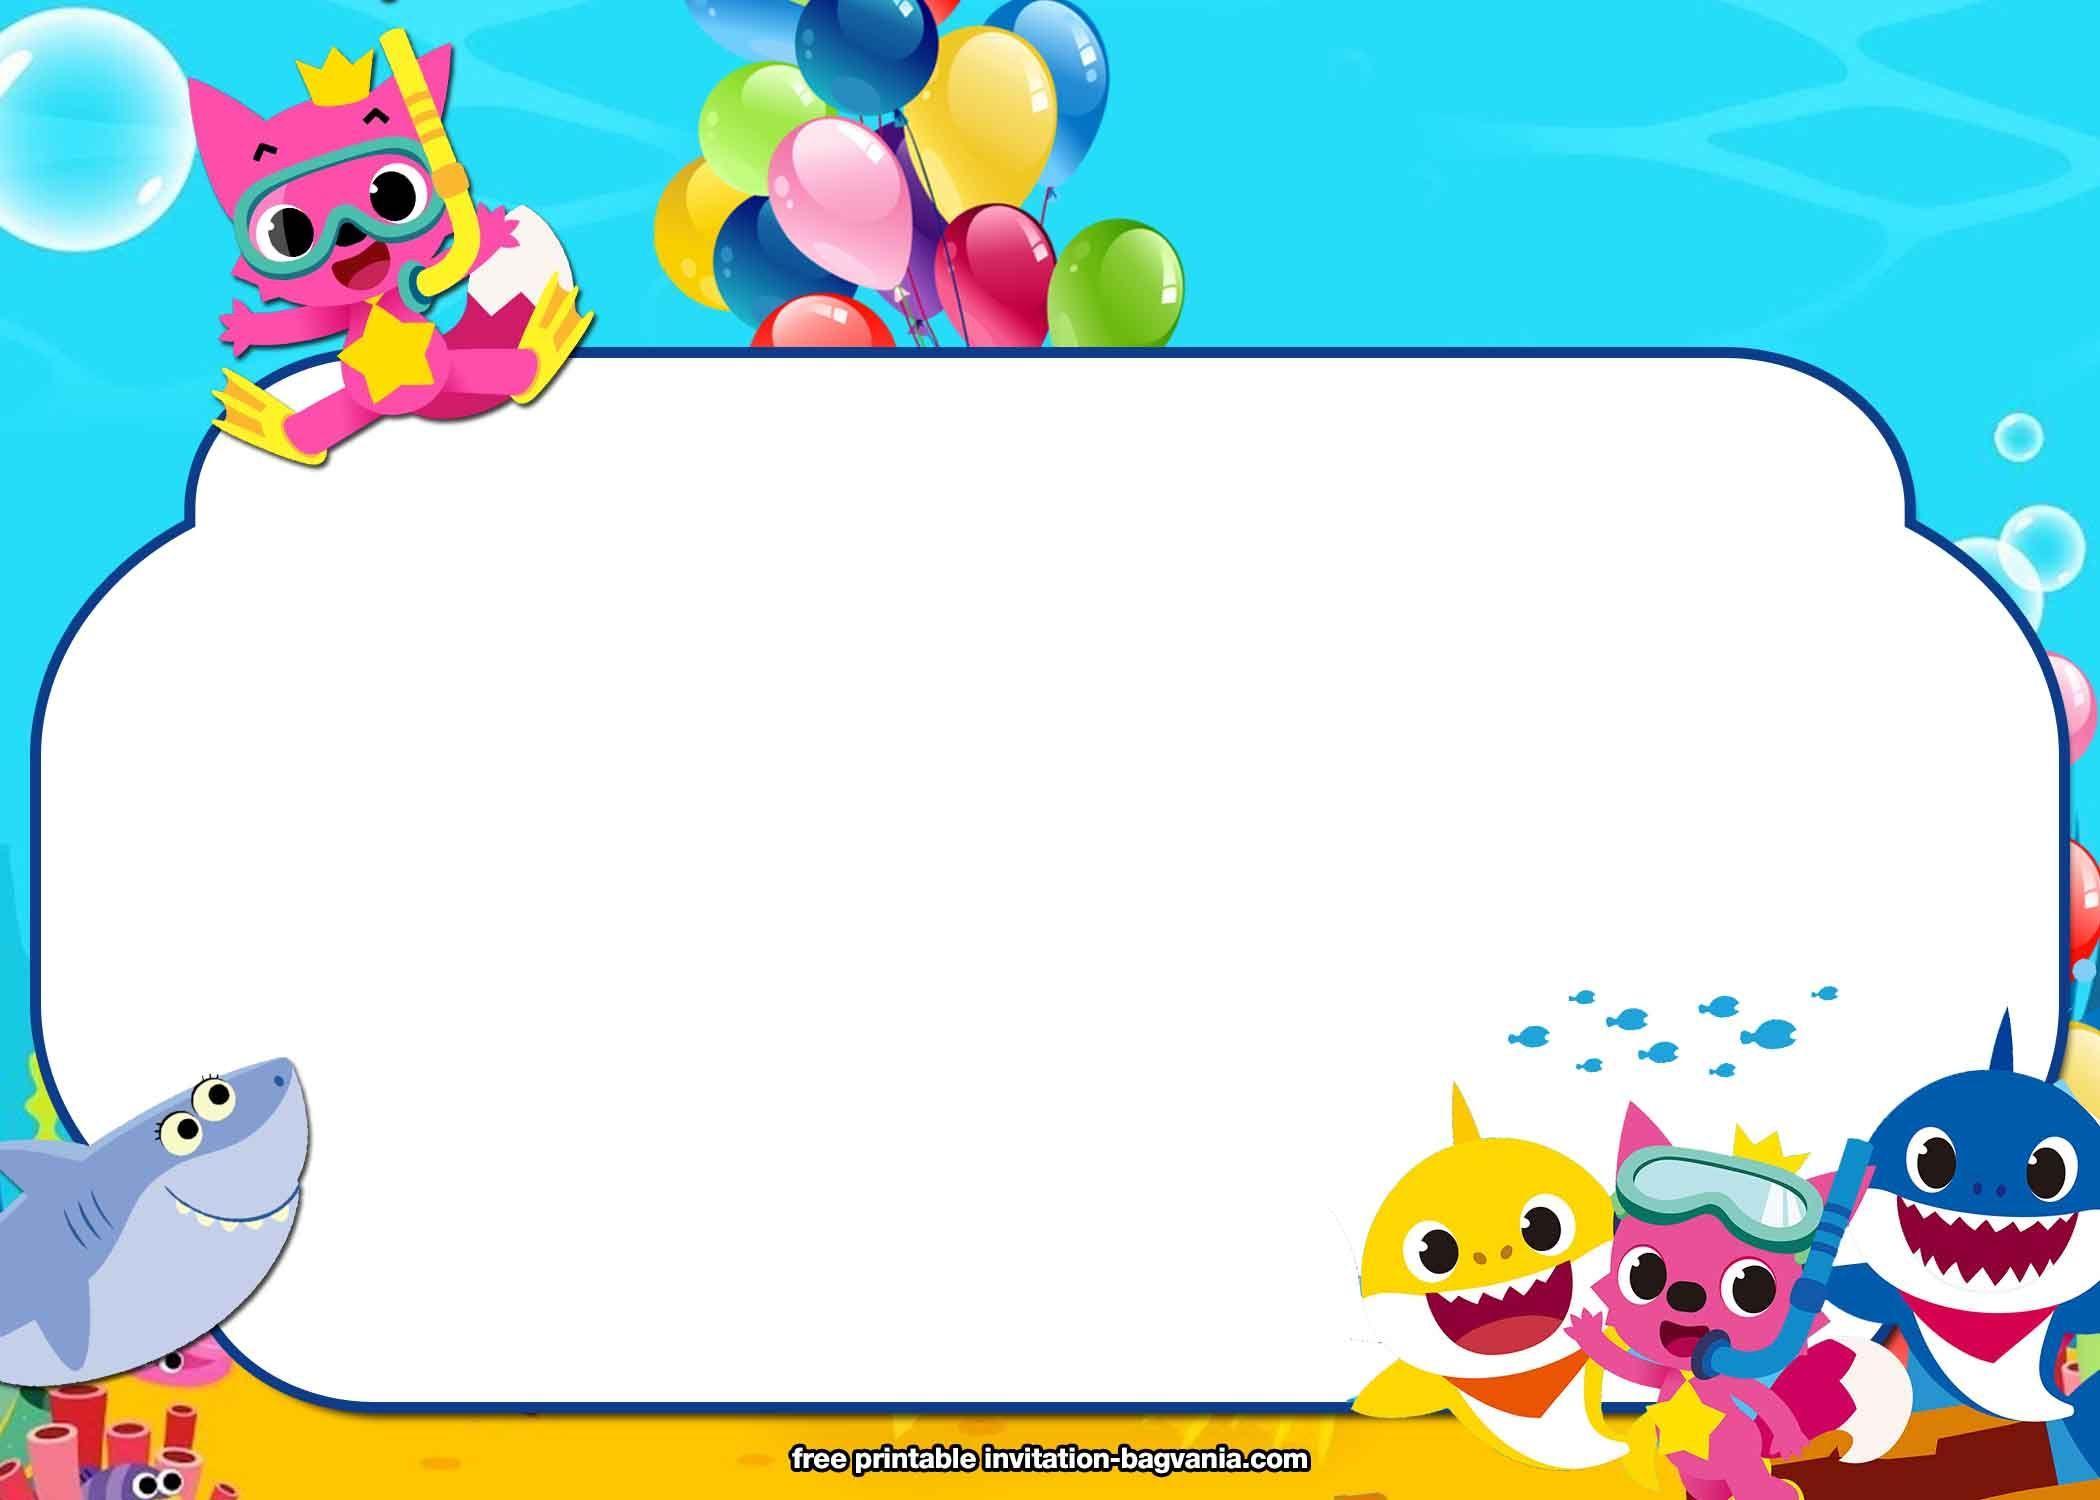 Birthday Baby Shark Wallpapers Top Free Birthday Baby Shark Backgrounds Wallpaperaccess